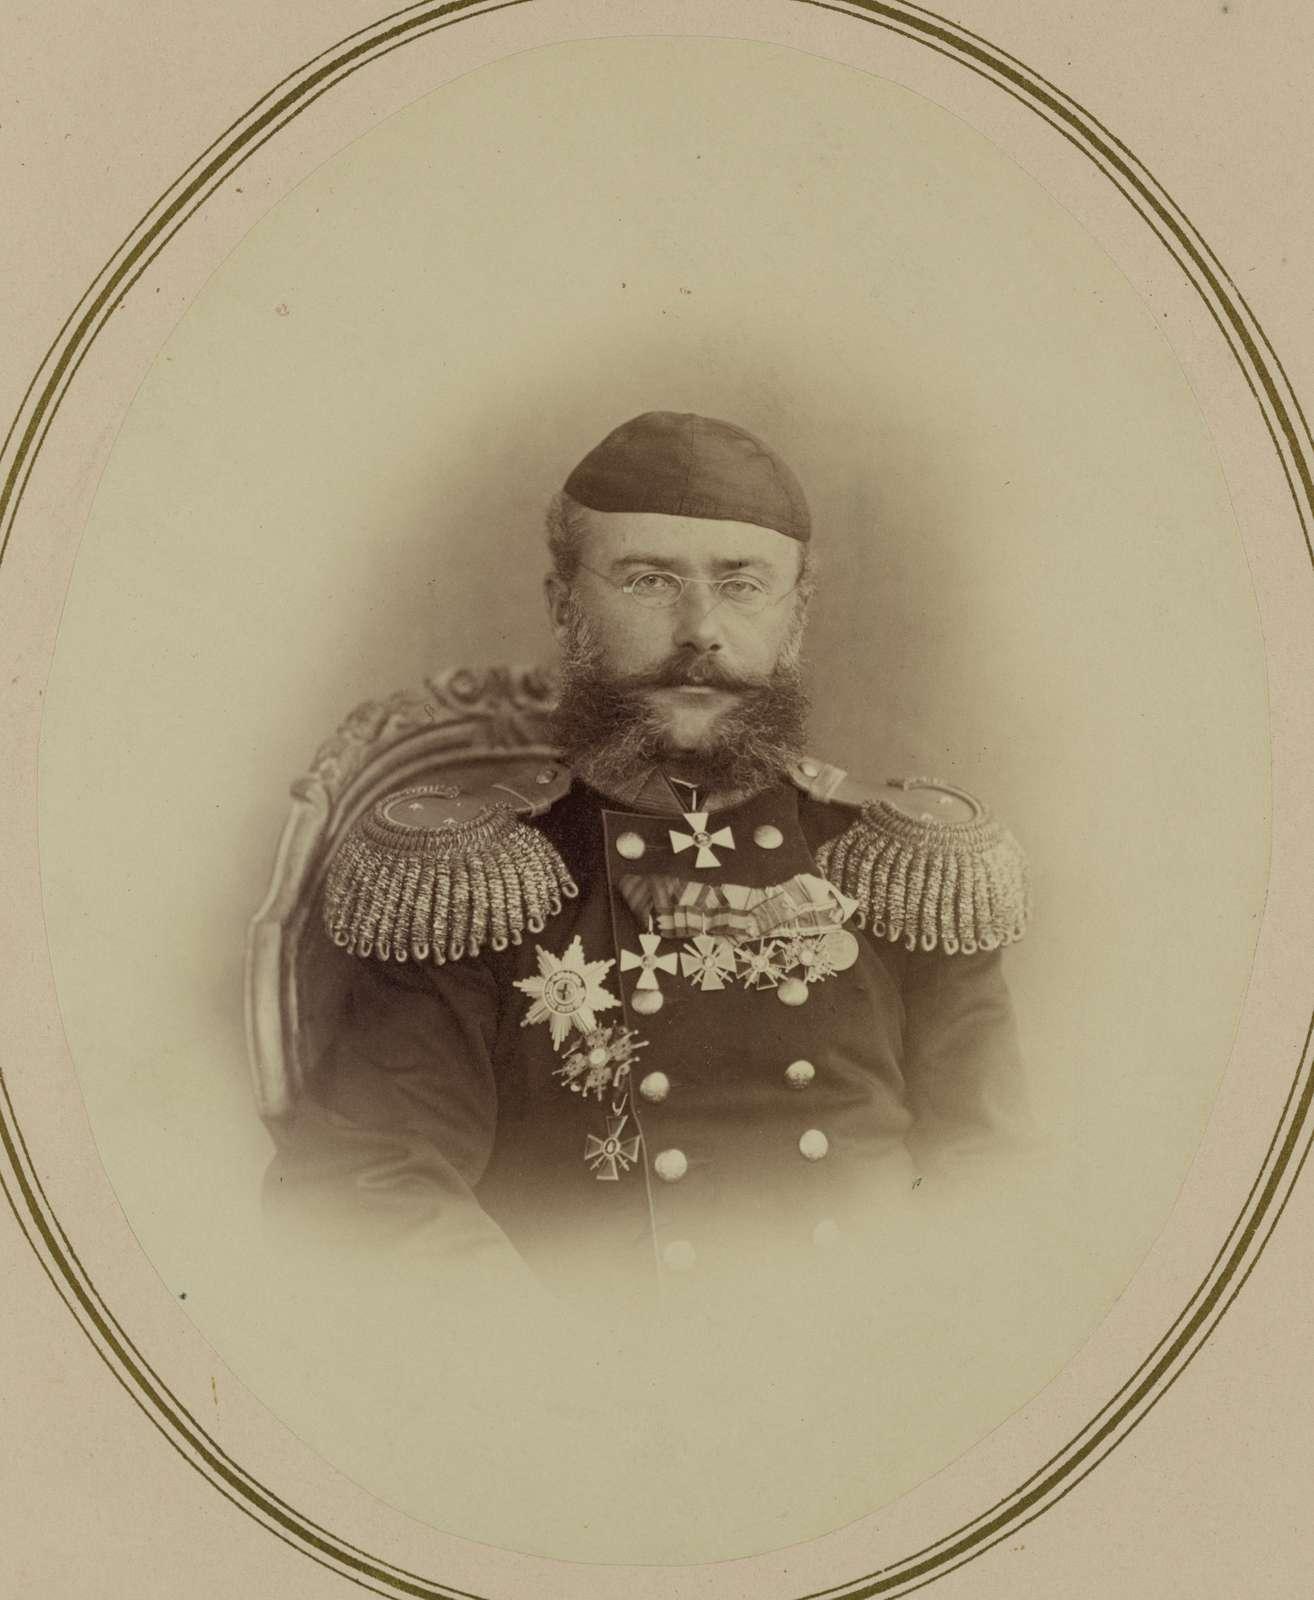 Georgievskie kavalery ordena 3i stepeni. Nachal'nik zaravshanskago okruga general-maior A. K. Abramov